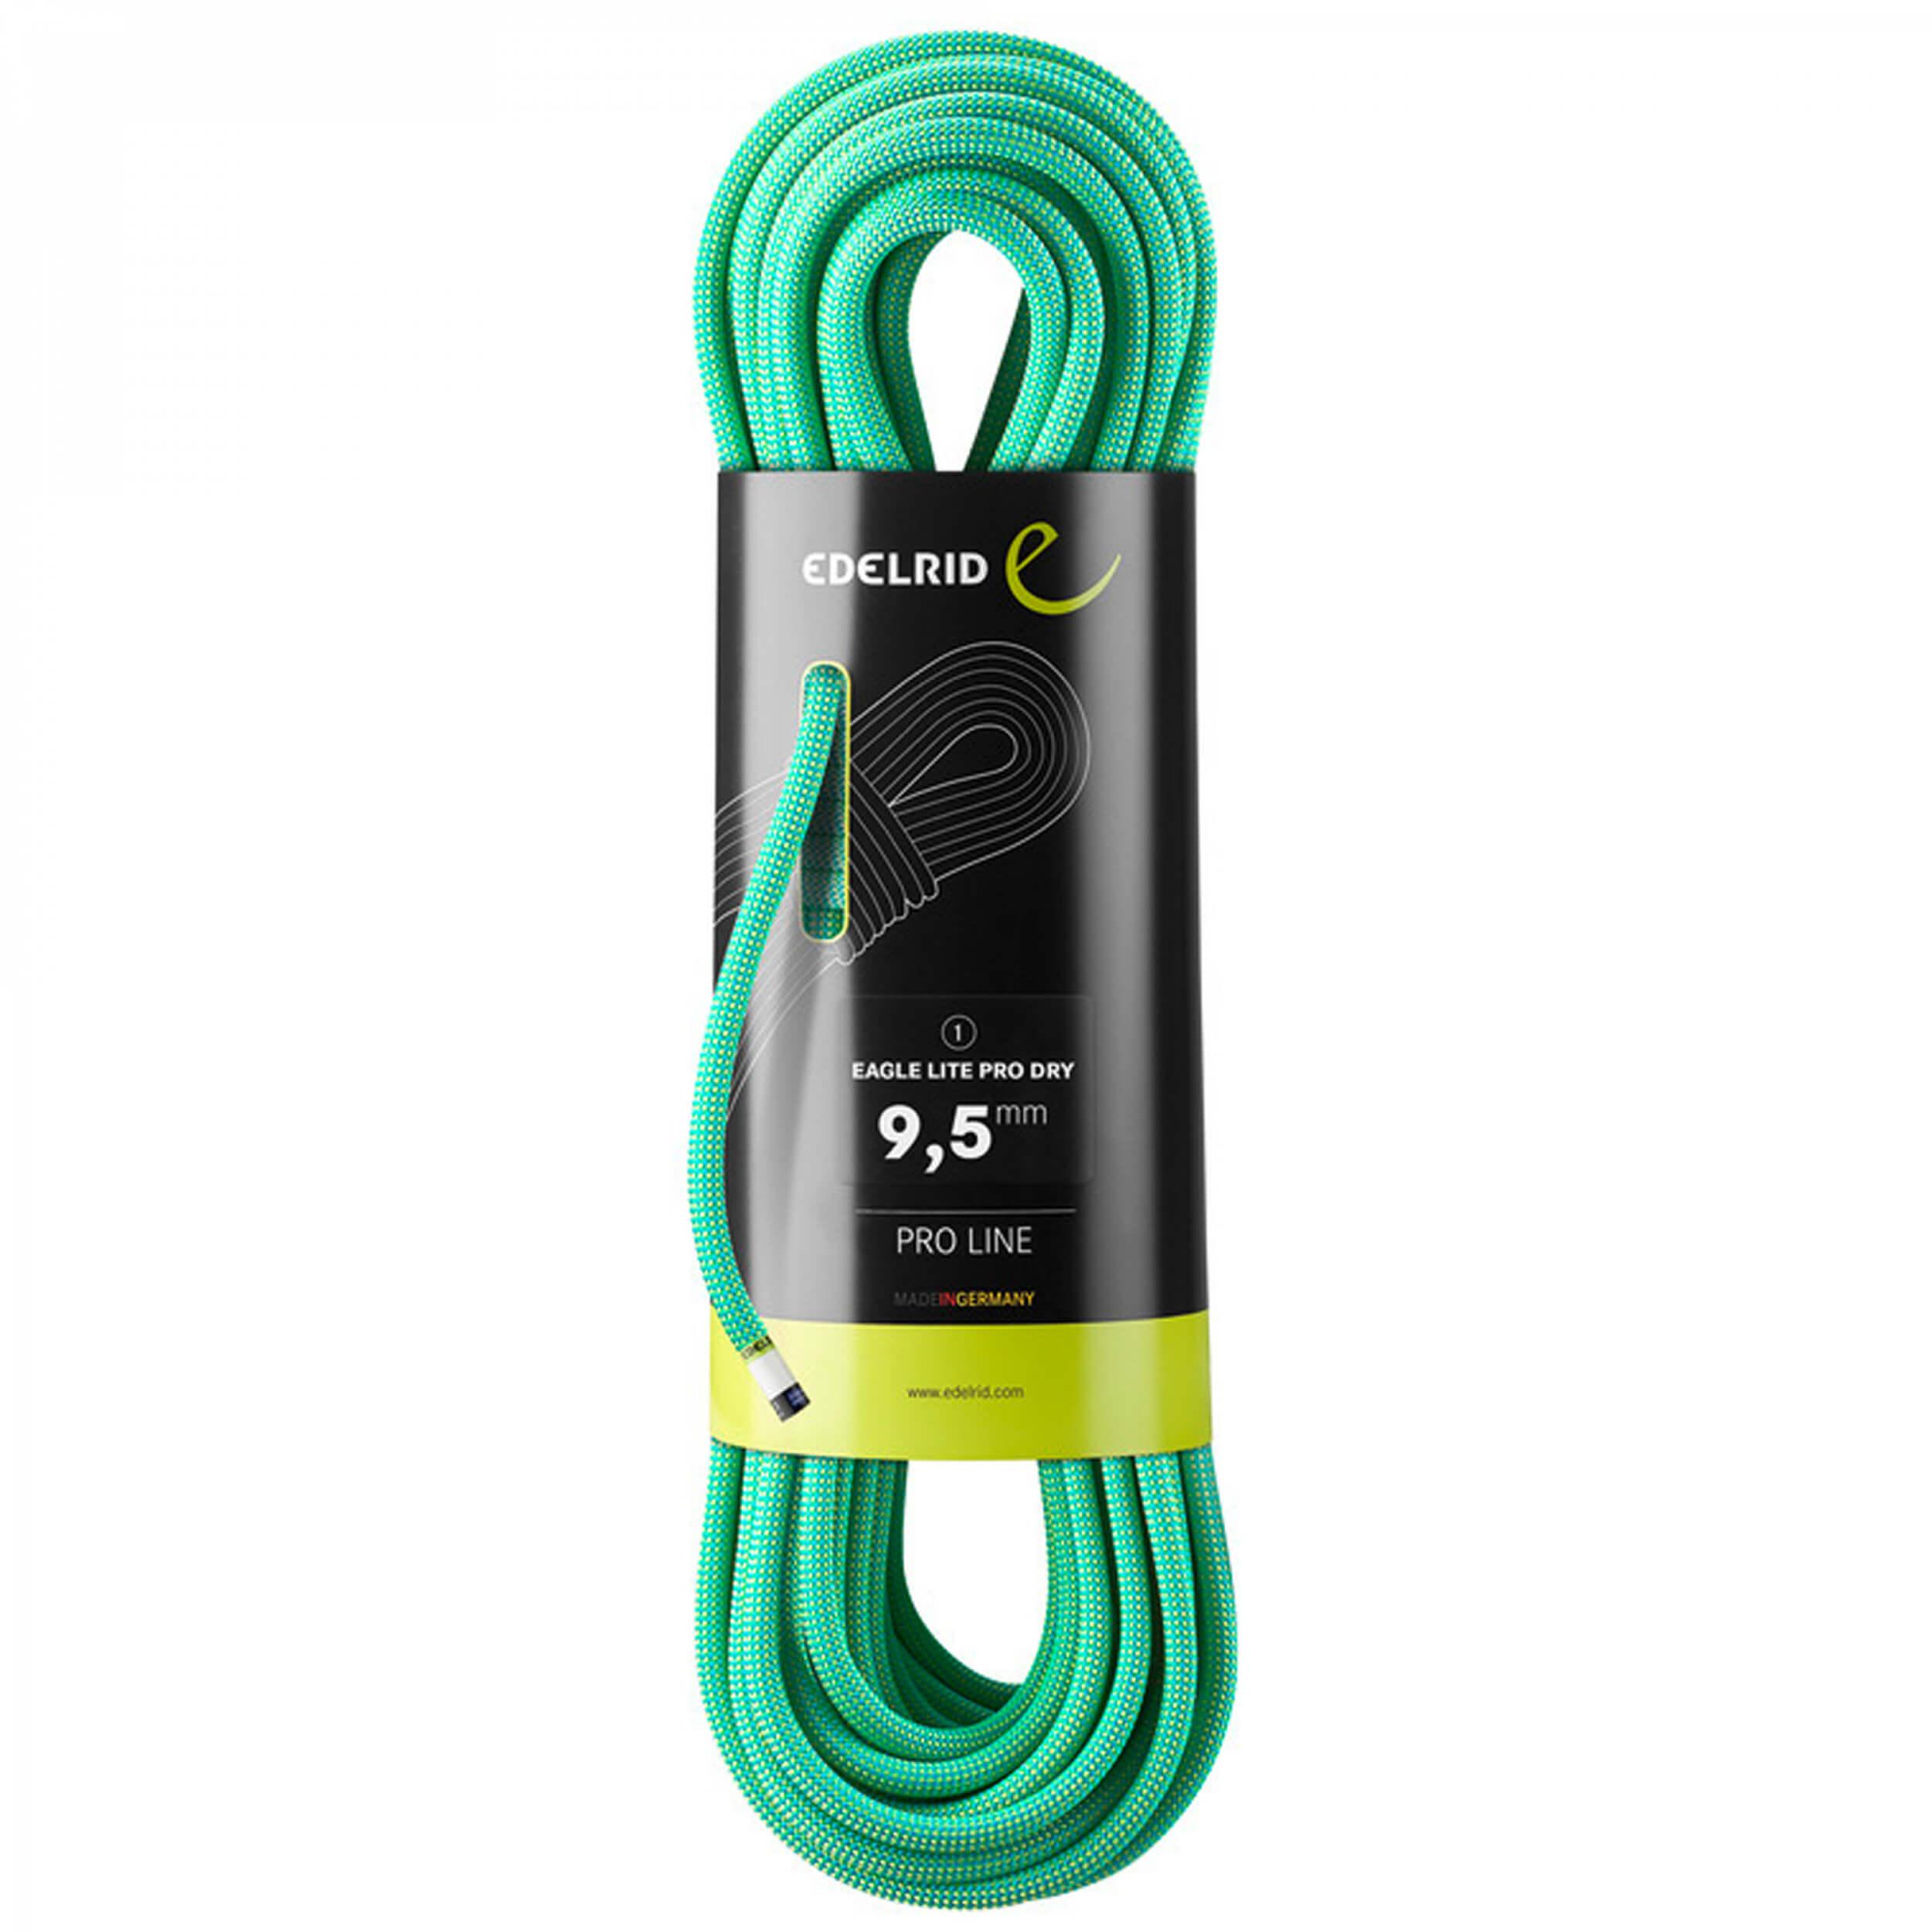 Edelrid Eagle Lite Pro Dry 9,5mm